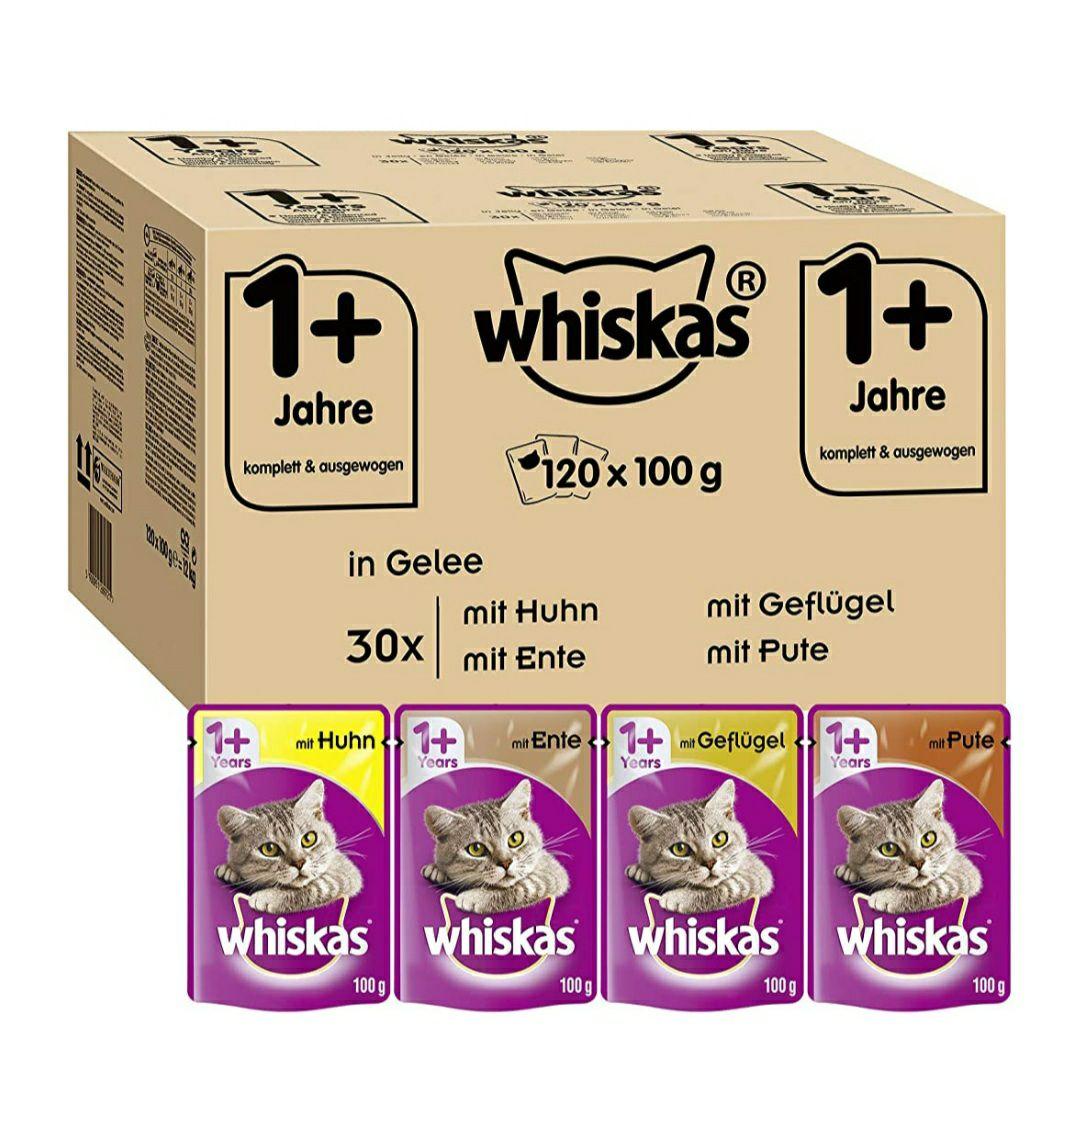 Whiskas Katzenfutter 1+ Adult / 120x100g / 2,07€/Kg